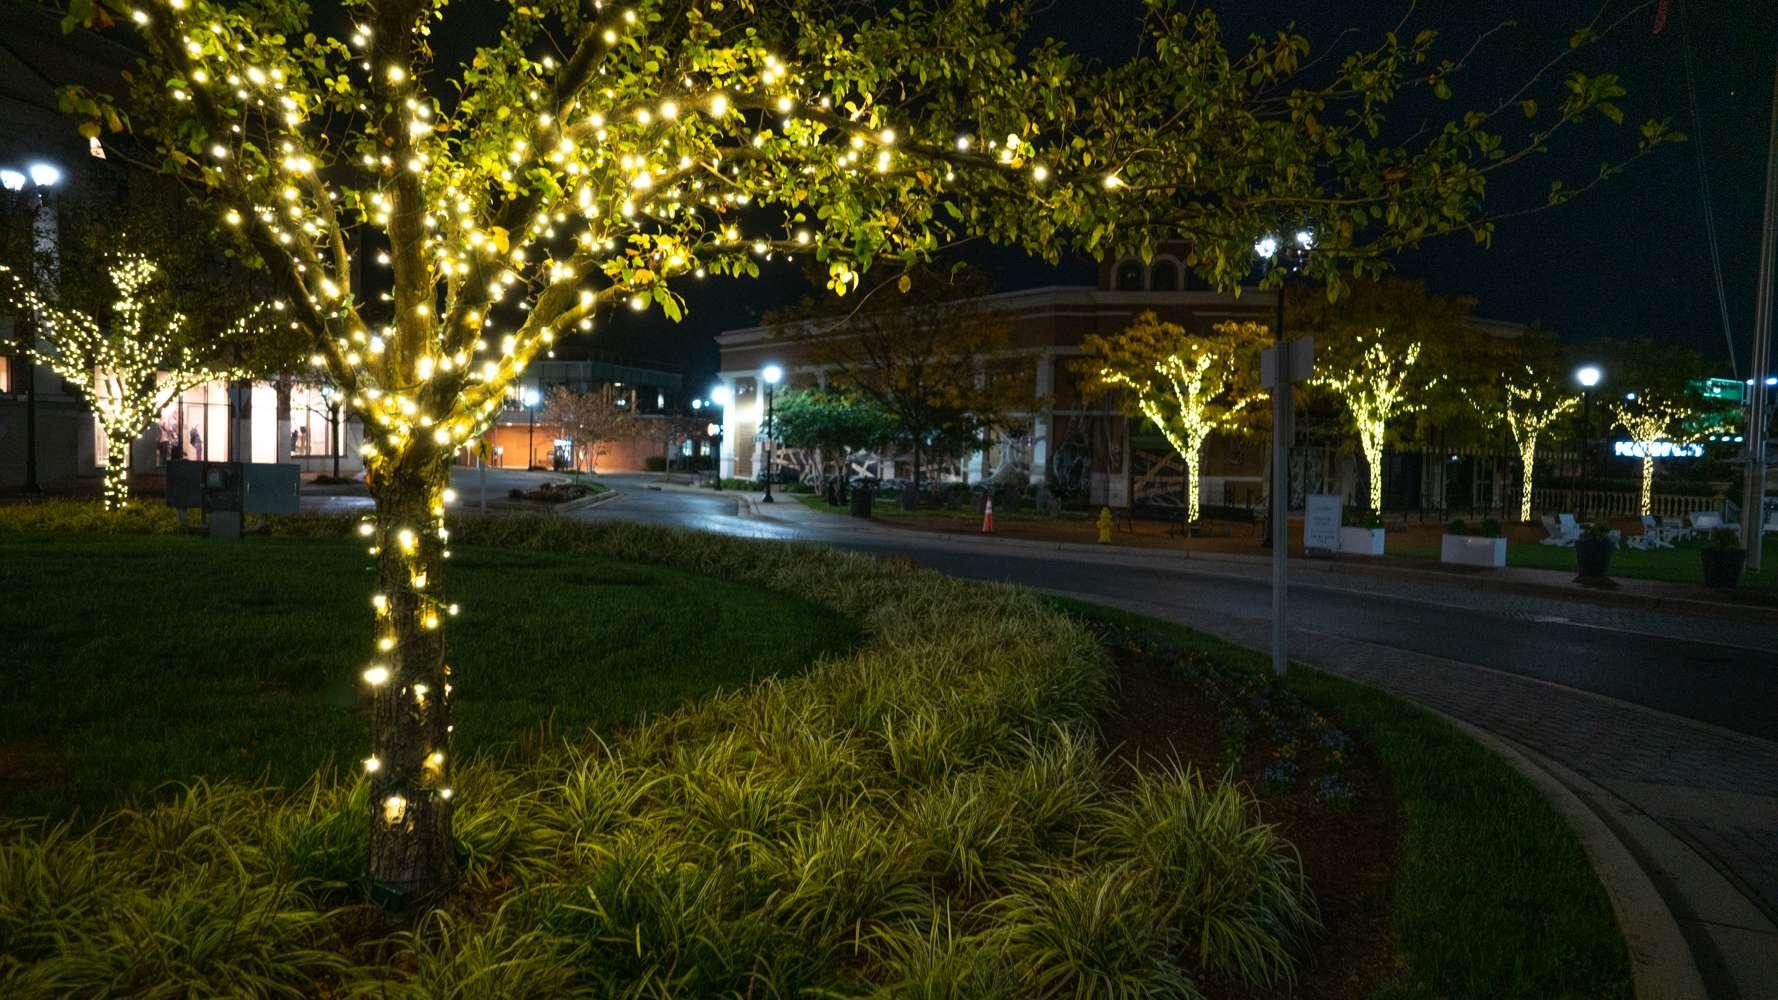 LevelGreen shopping center tree lighting lights landscaping lawn perennials grasses 2